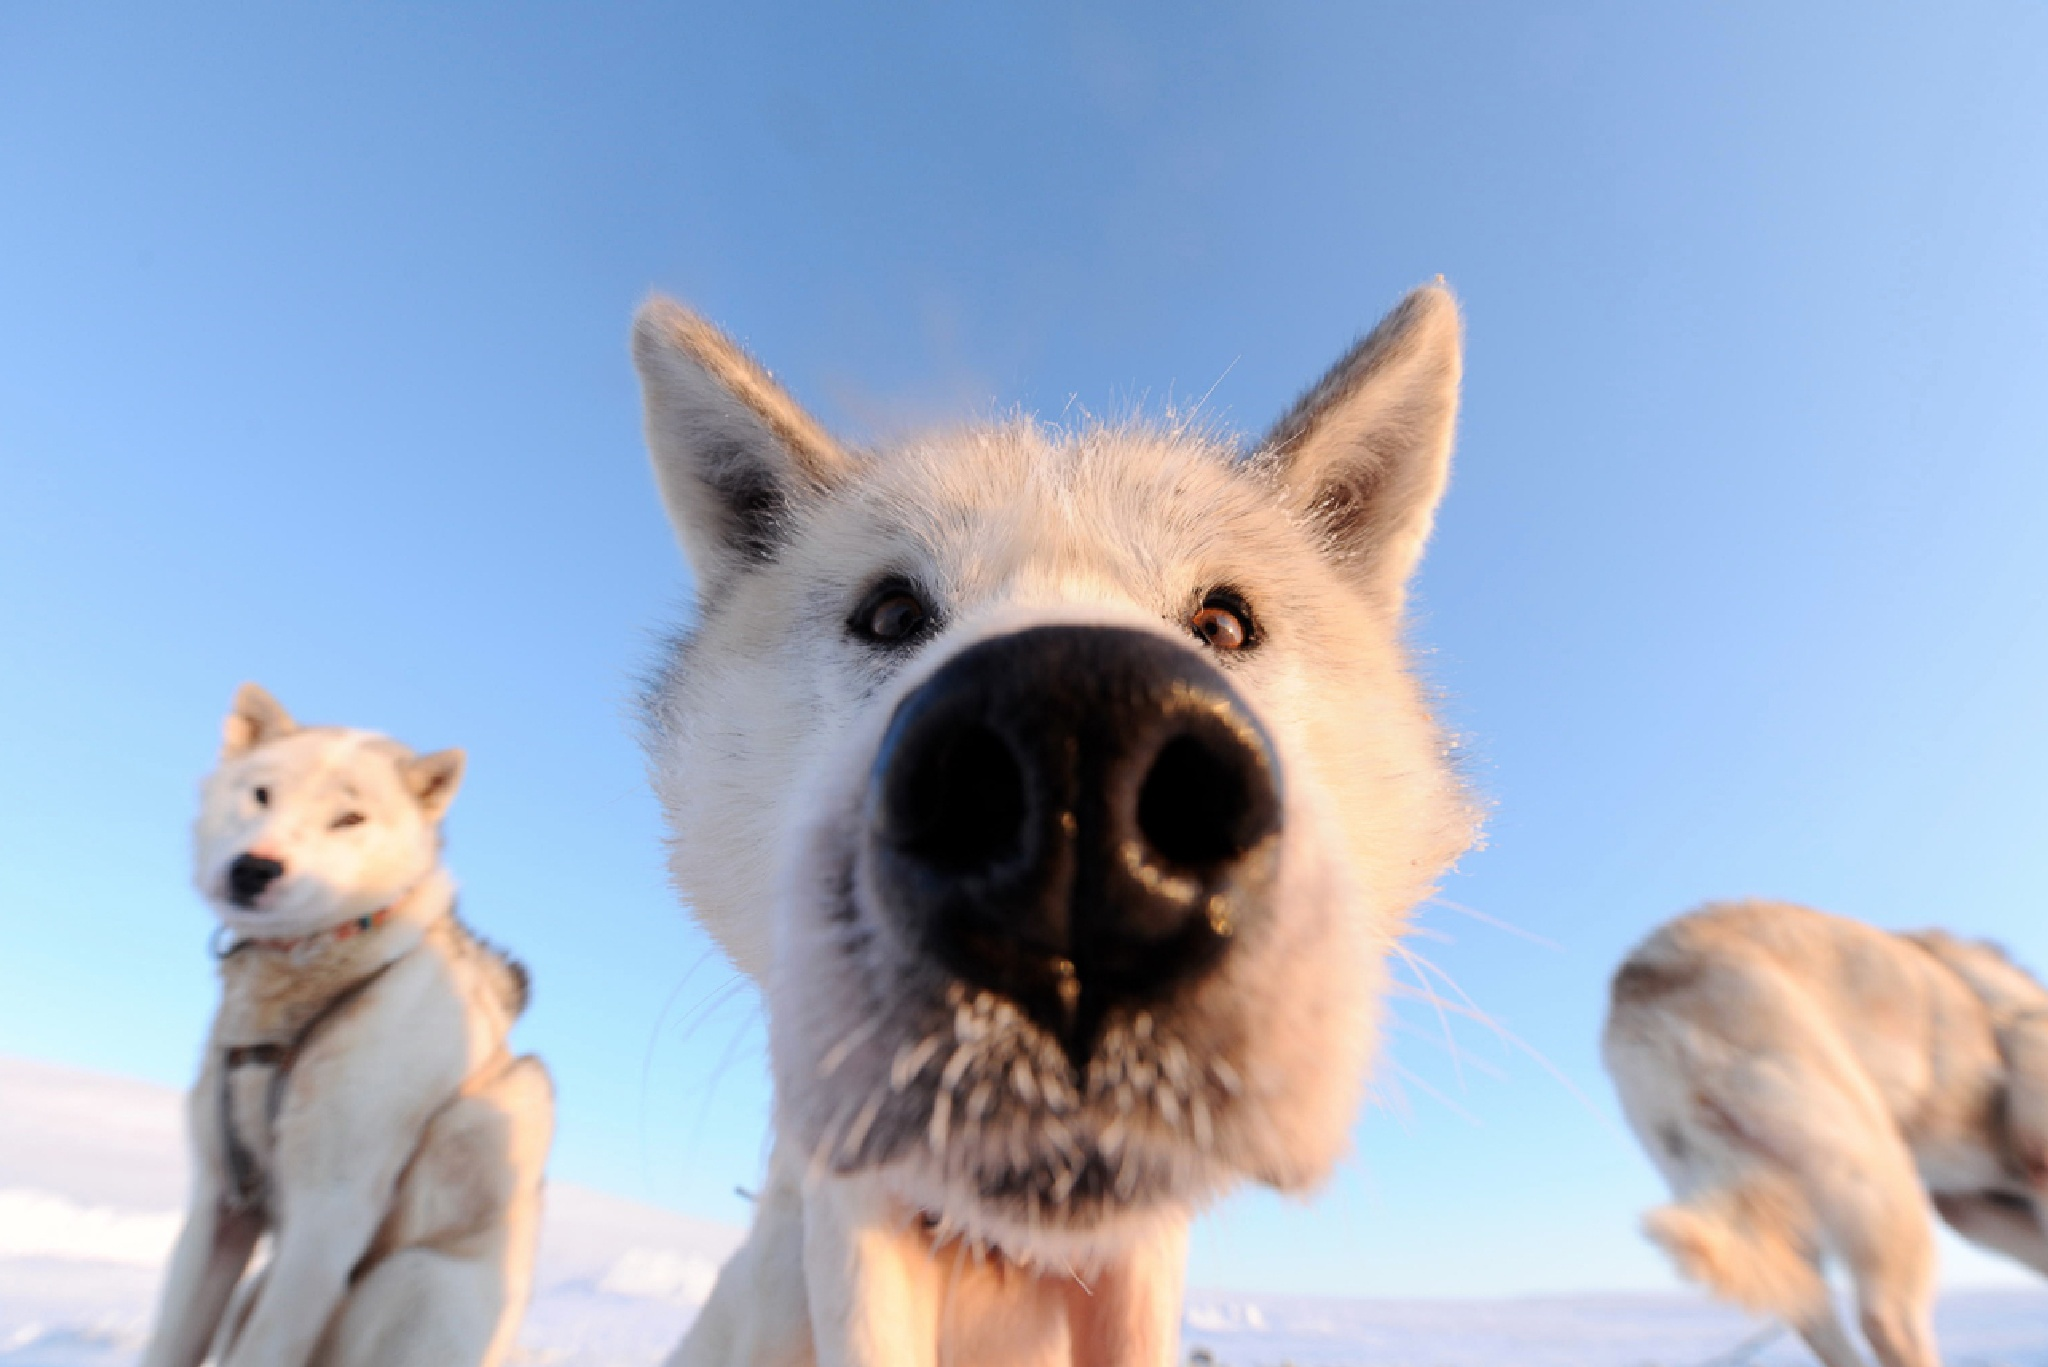 Polar Dog by Martin Hartley